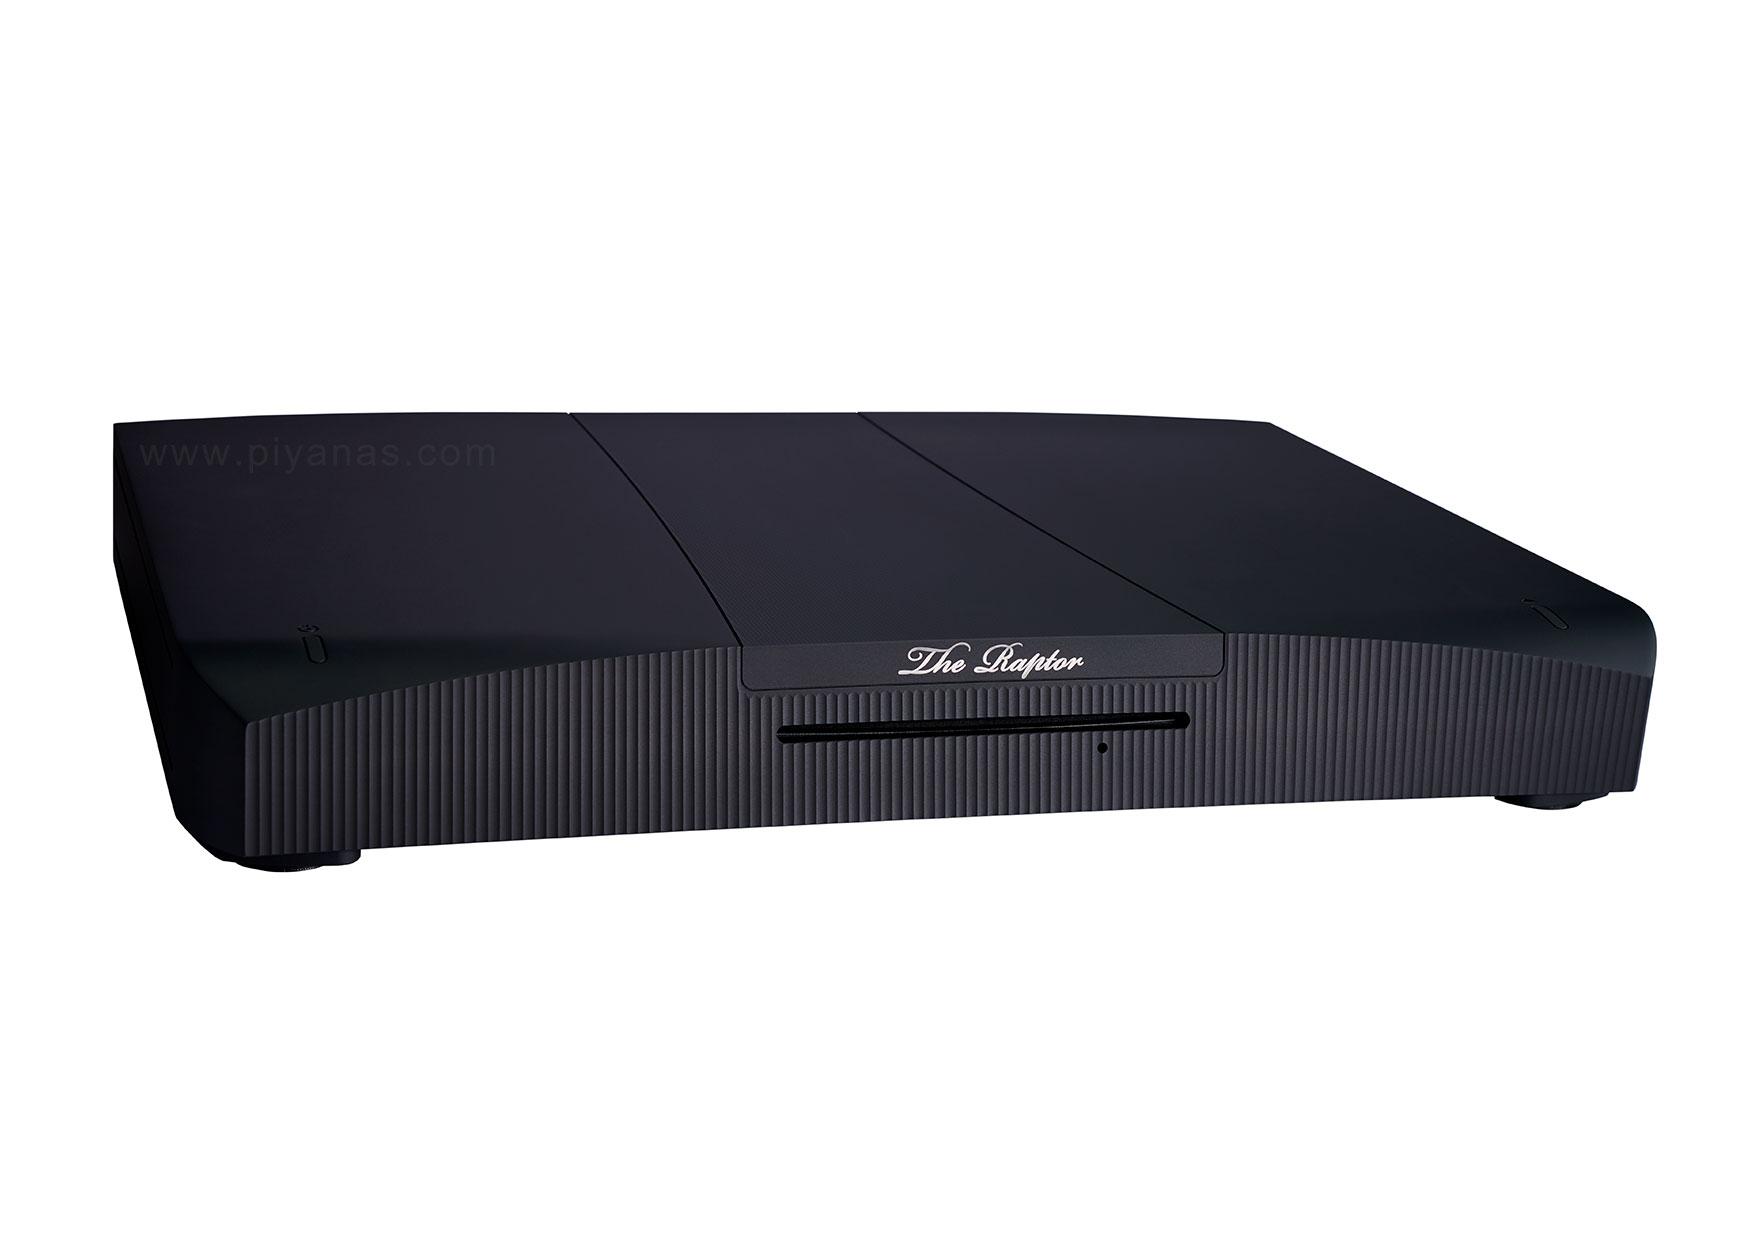 The Raptor 4 TB SSD (Black)